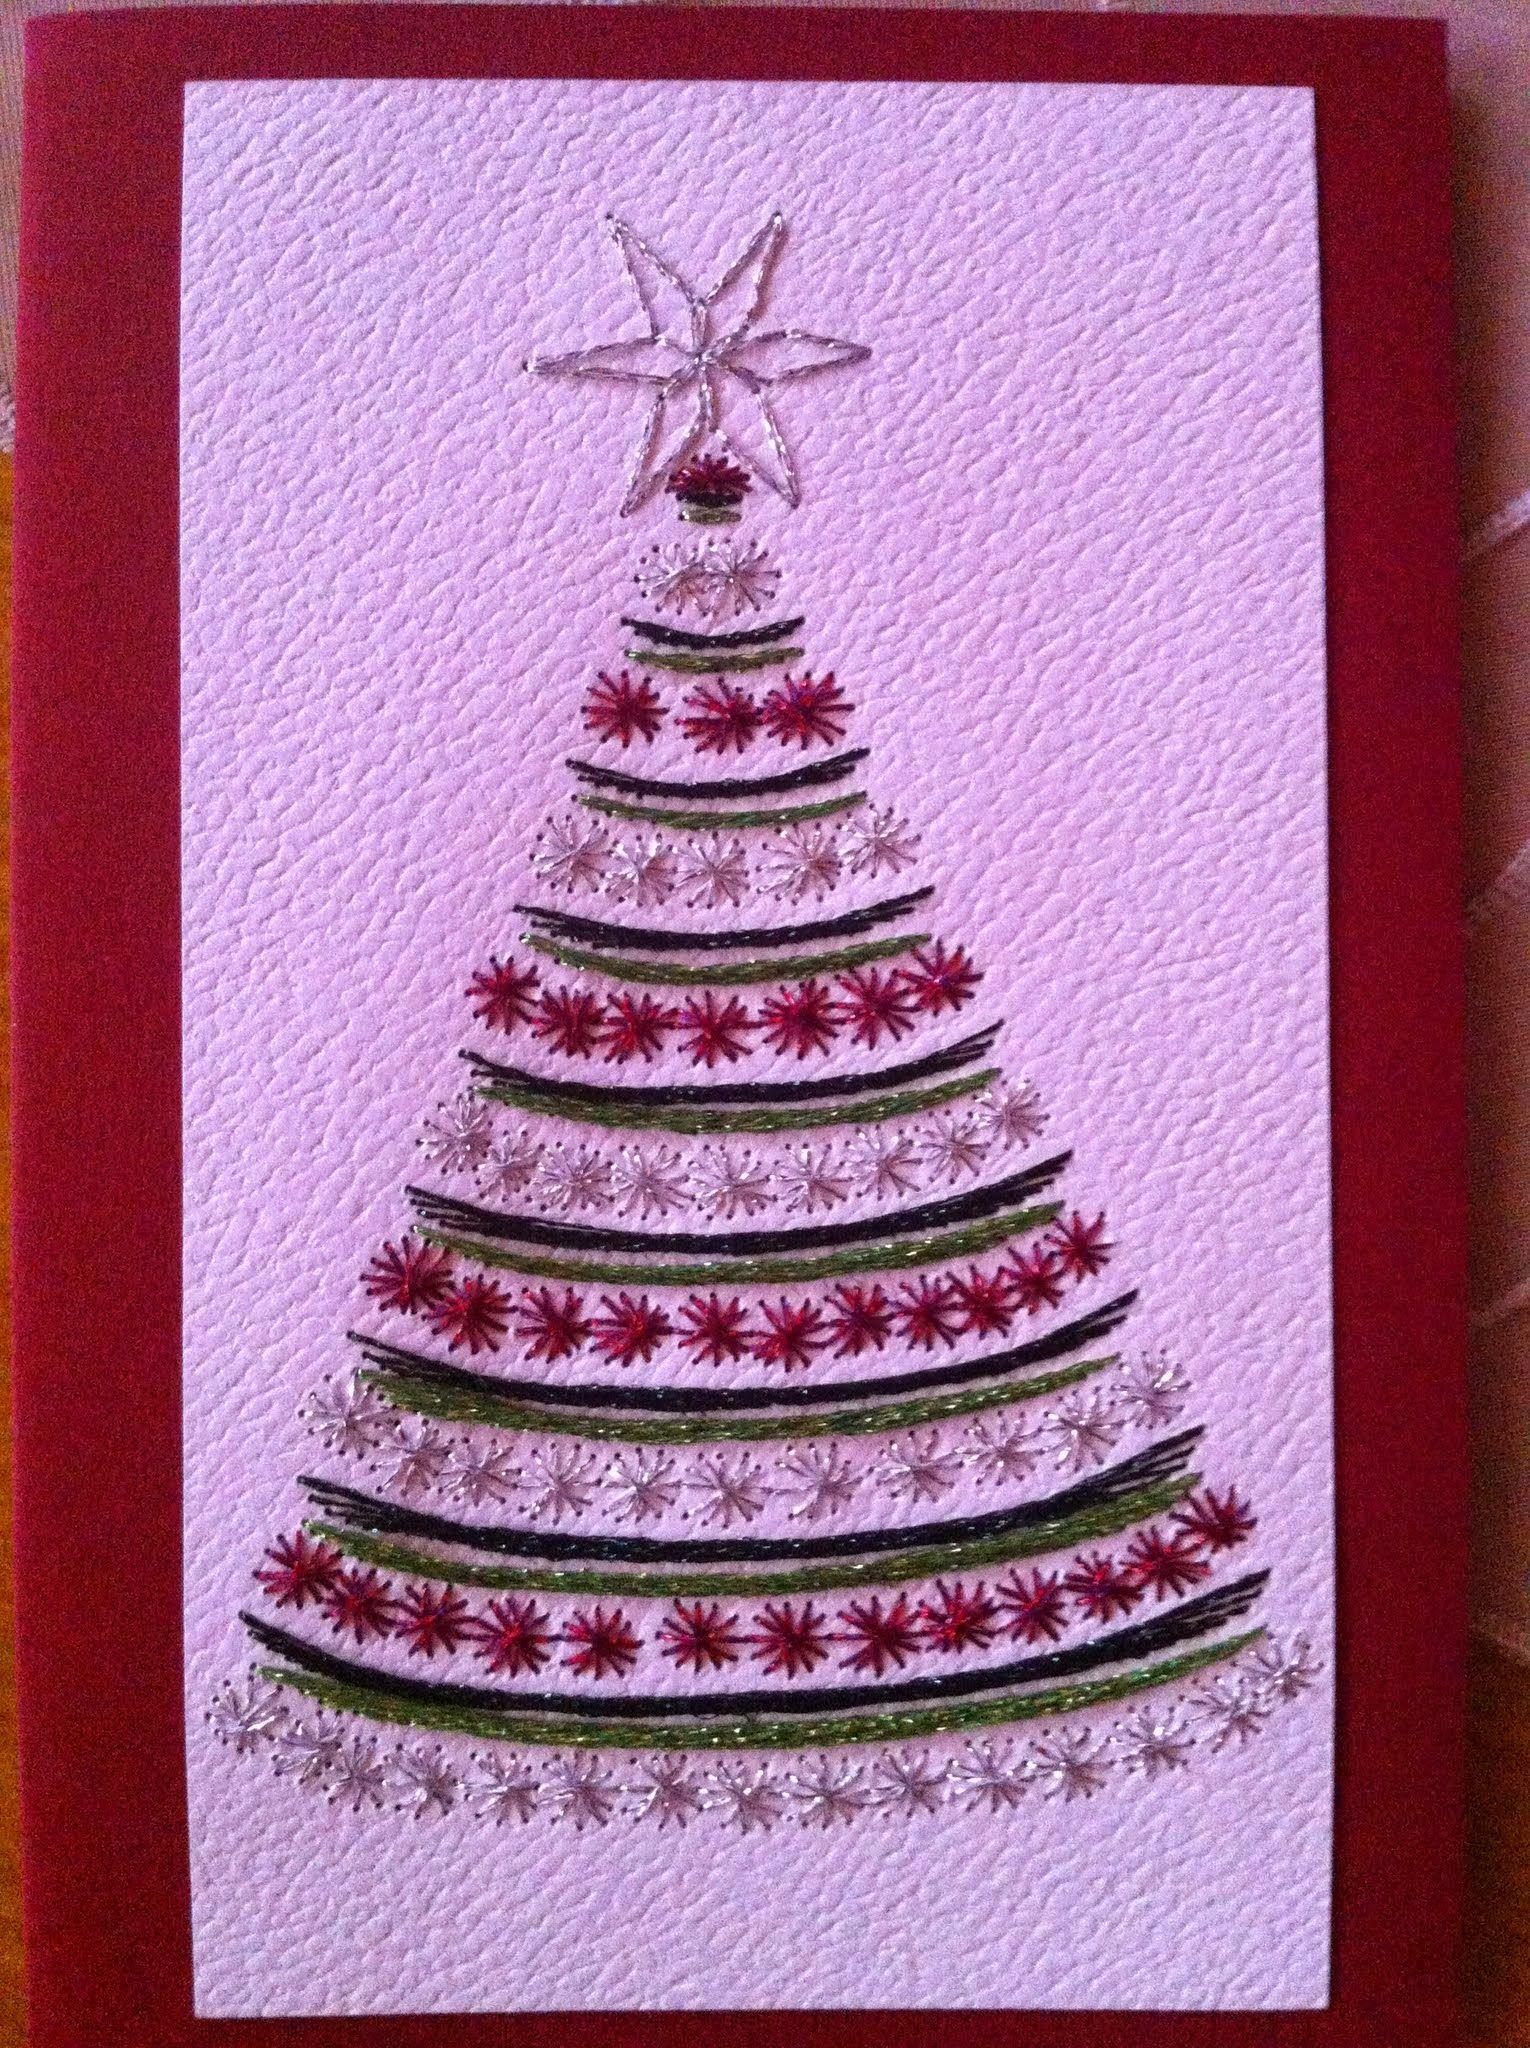 photo bo i ne estitke pinterest fadengrafik fadengrafik karten and weihnachtsbasteleien. Black Bedroom Furniture Sets. Home Design Ideas